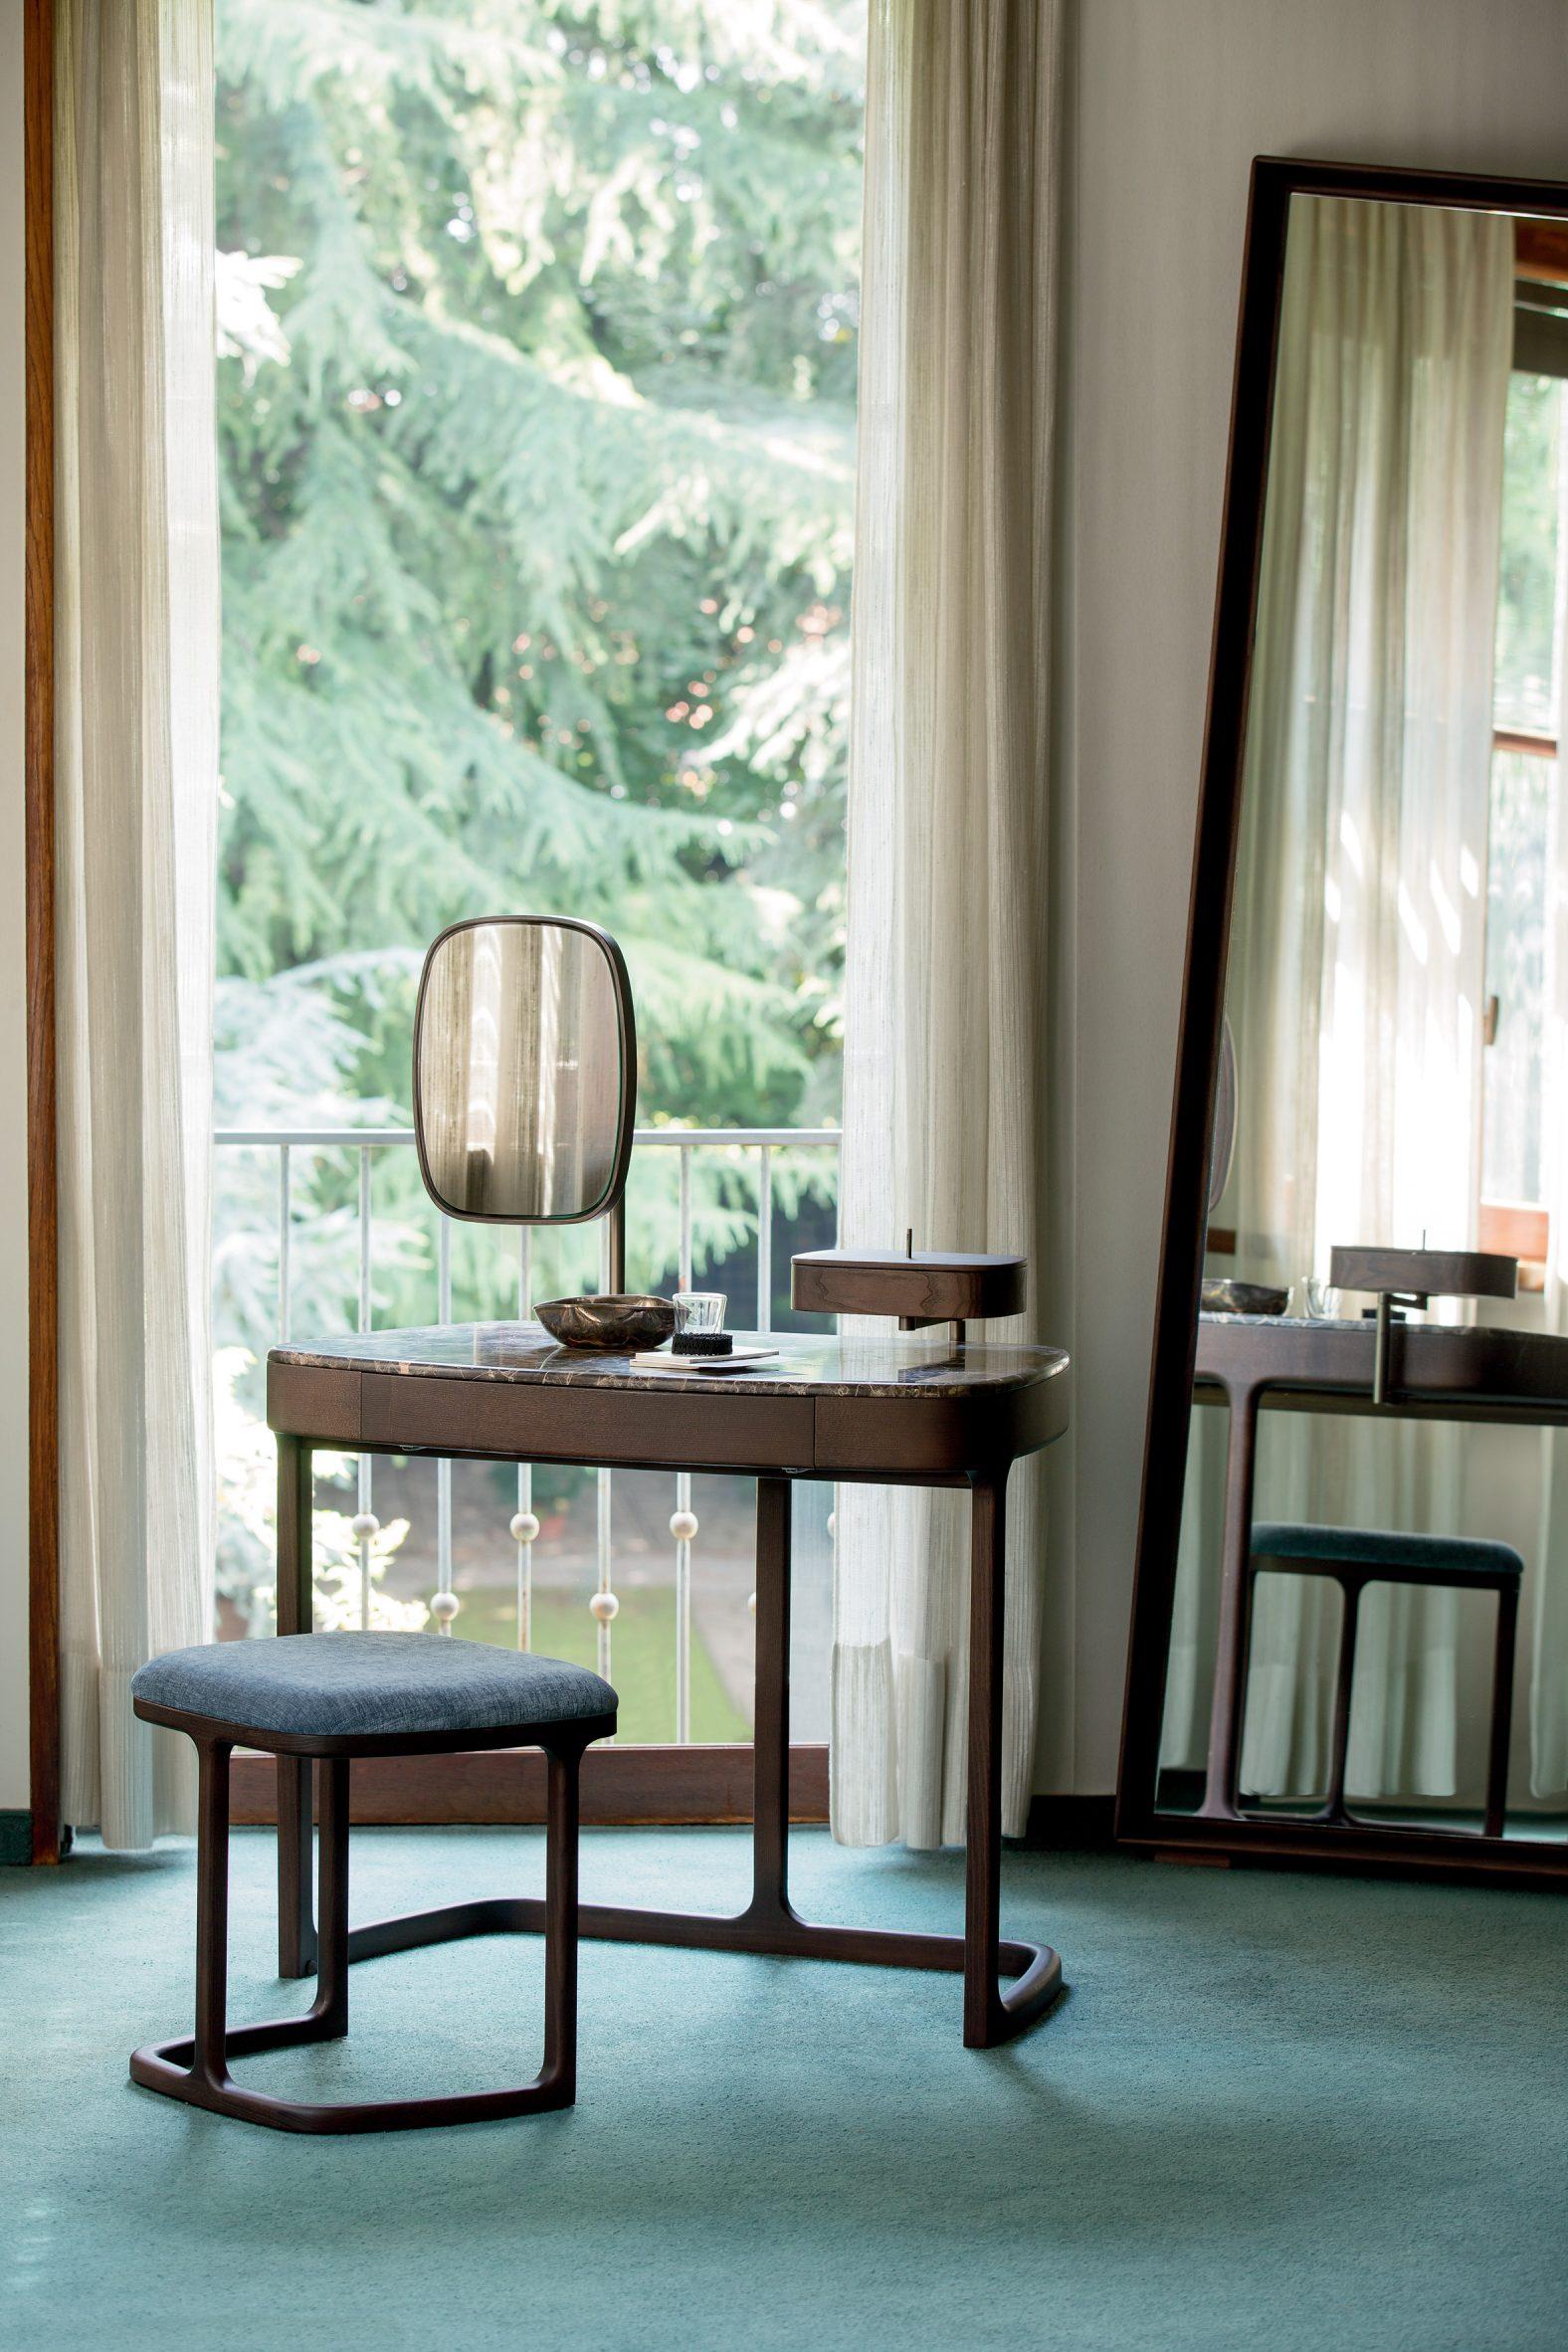 A photograph of Porada's wooden furniture